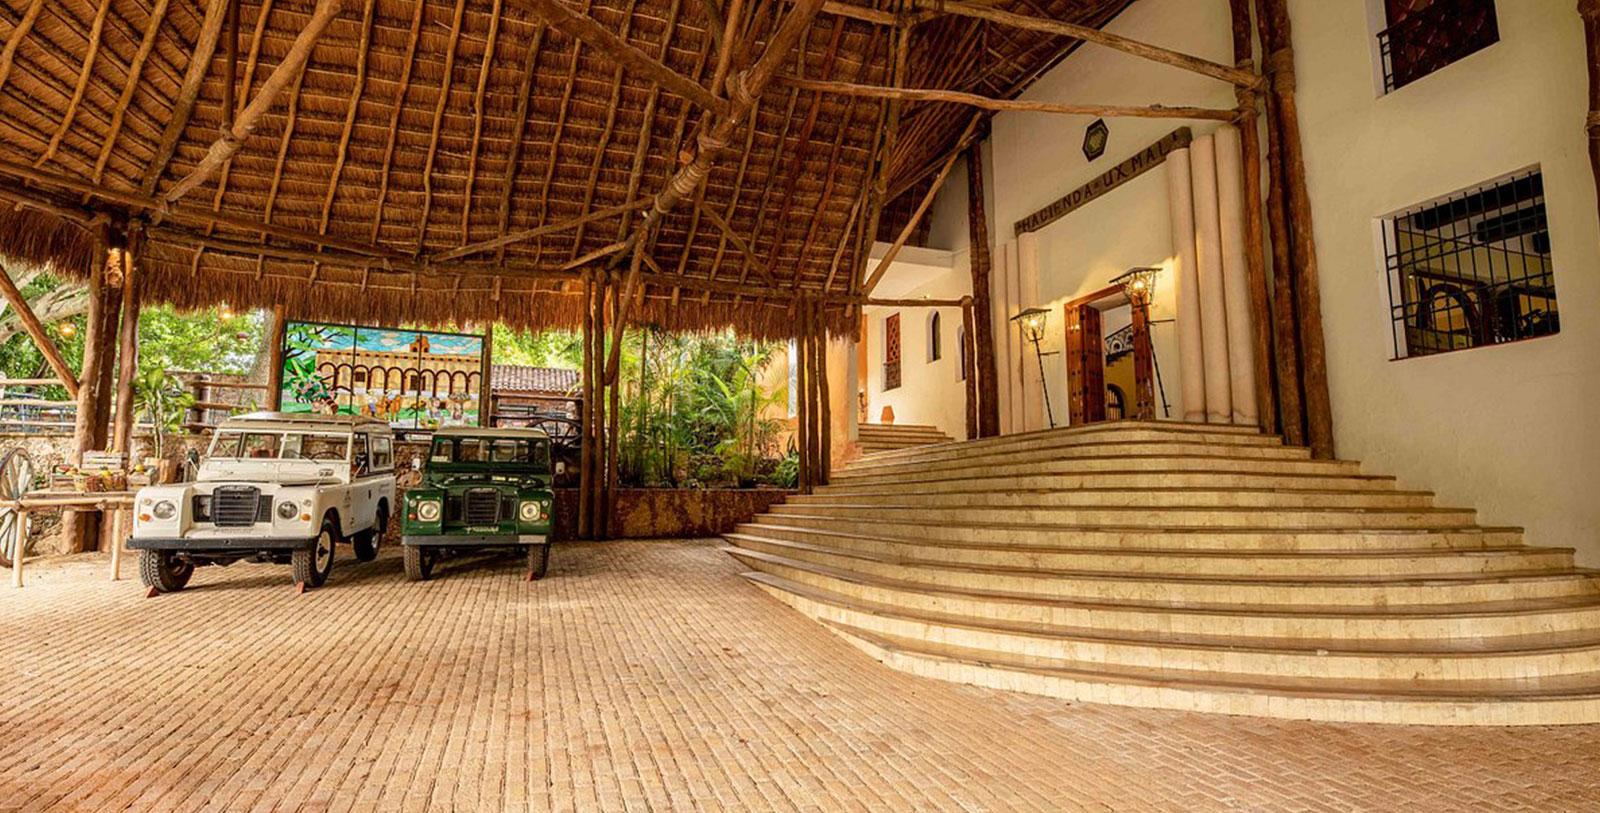 Image of Hotel Exterior Entrance, Hacienda Uxmal Plantation & Museum, Member of Historic Hotels Worldwide, Hot Deals